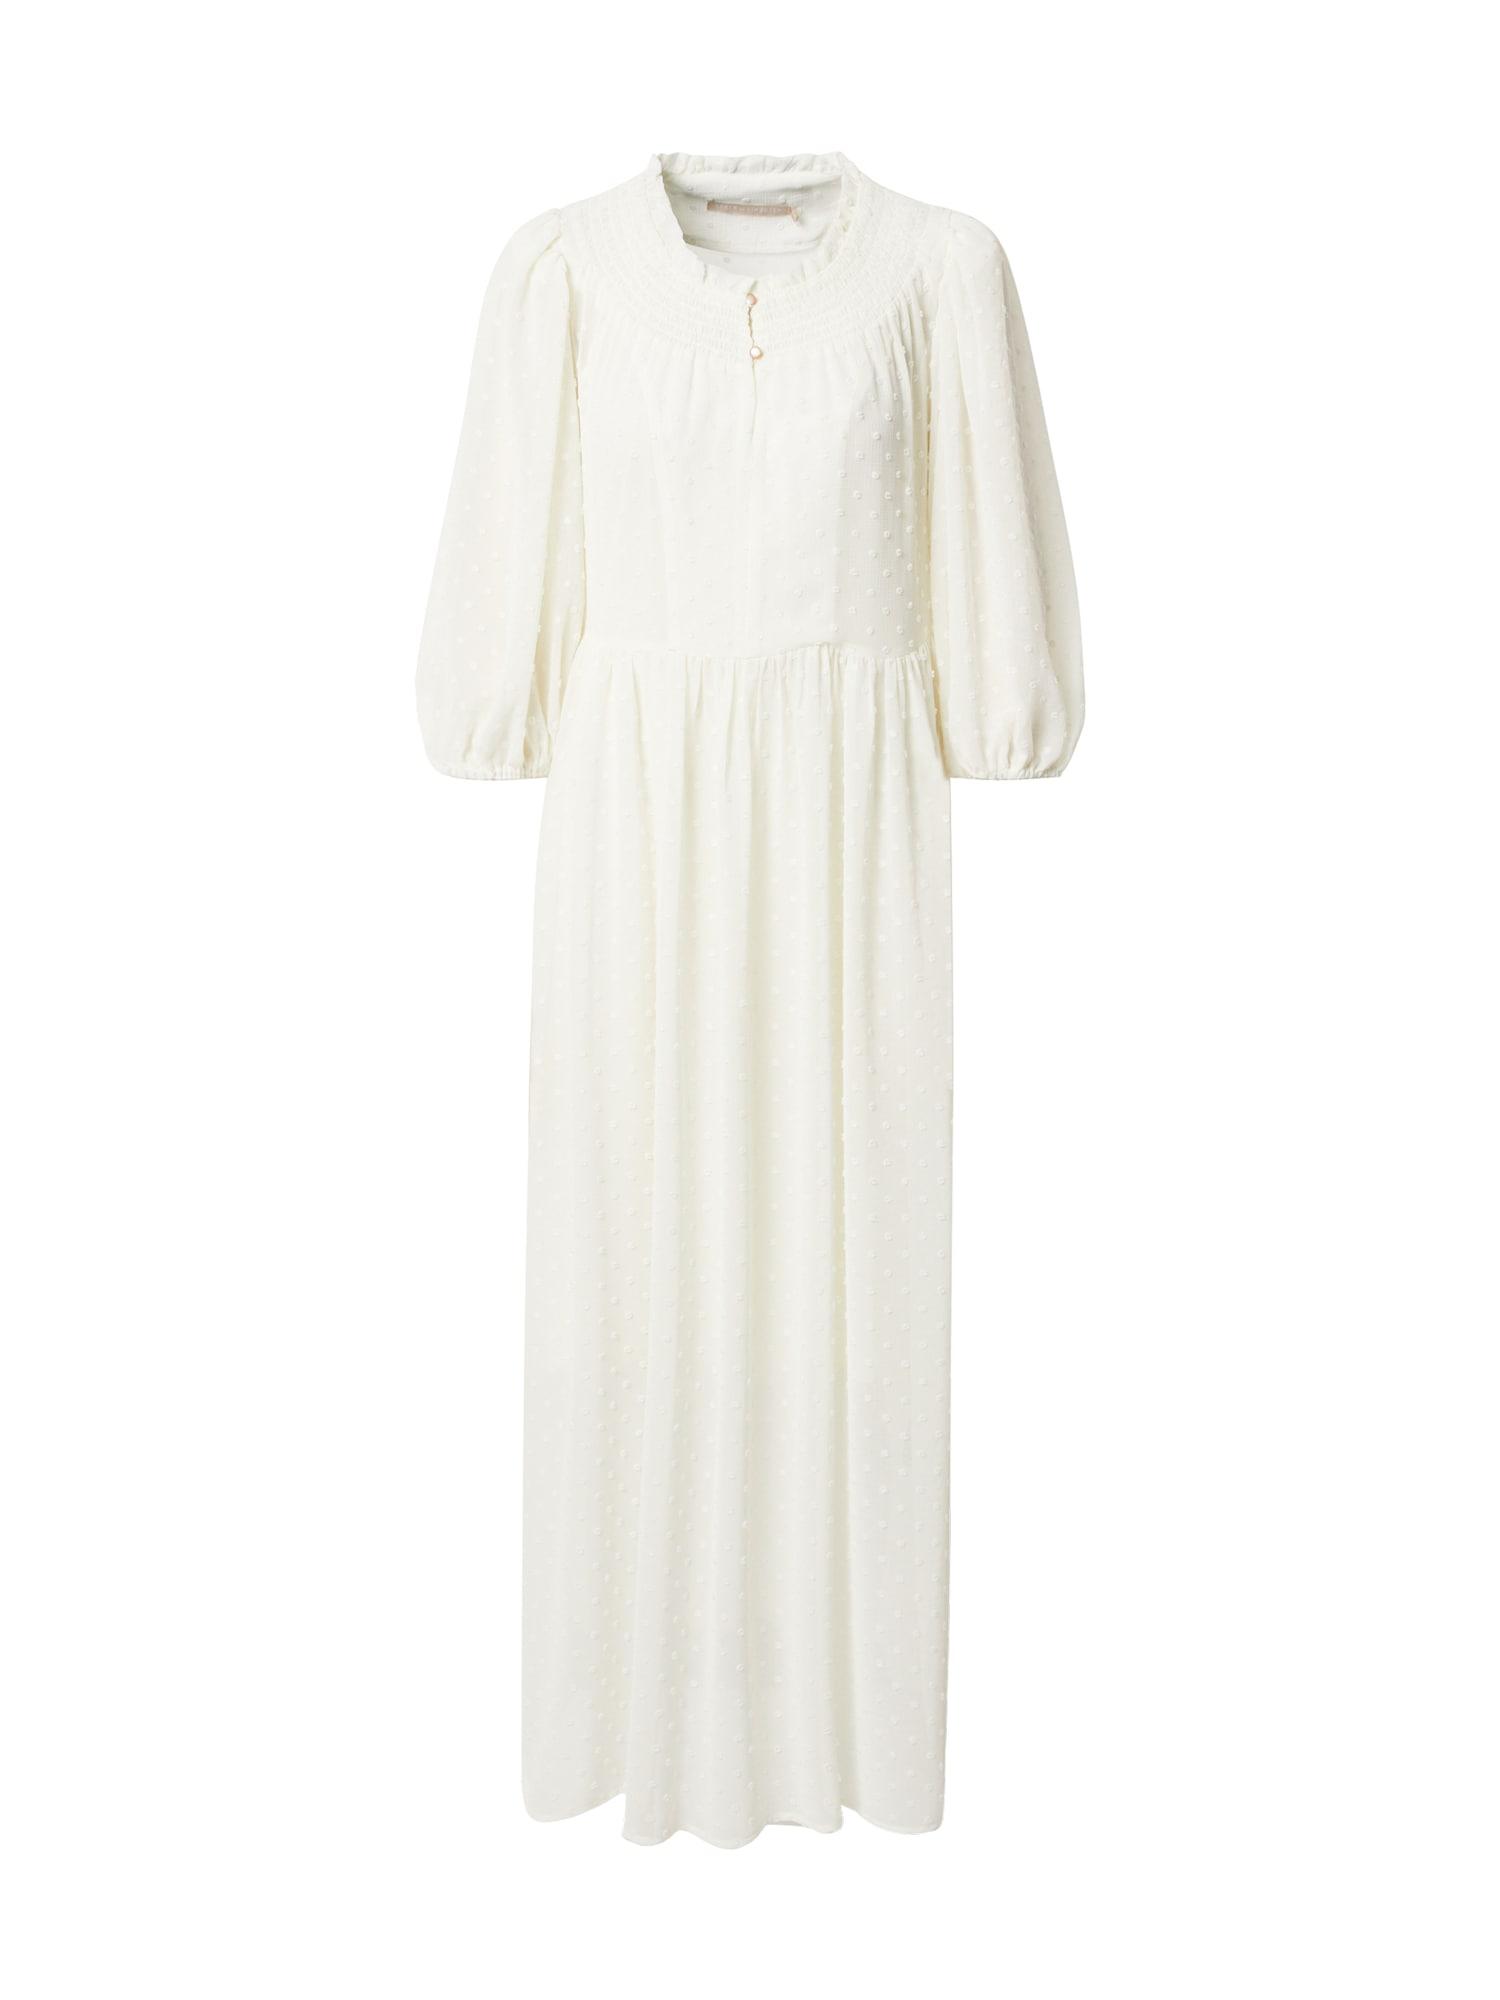 KAREN BY SIMONSEN Suknelė gelsvai pilka spalva